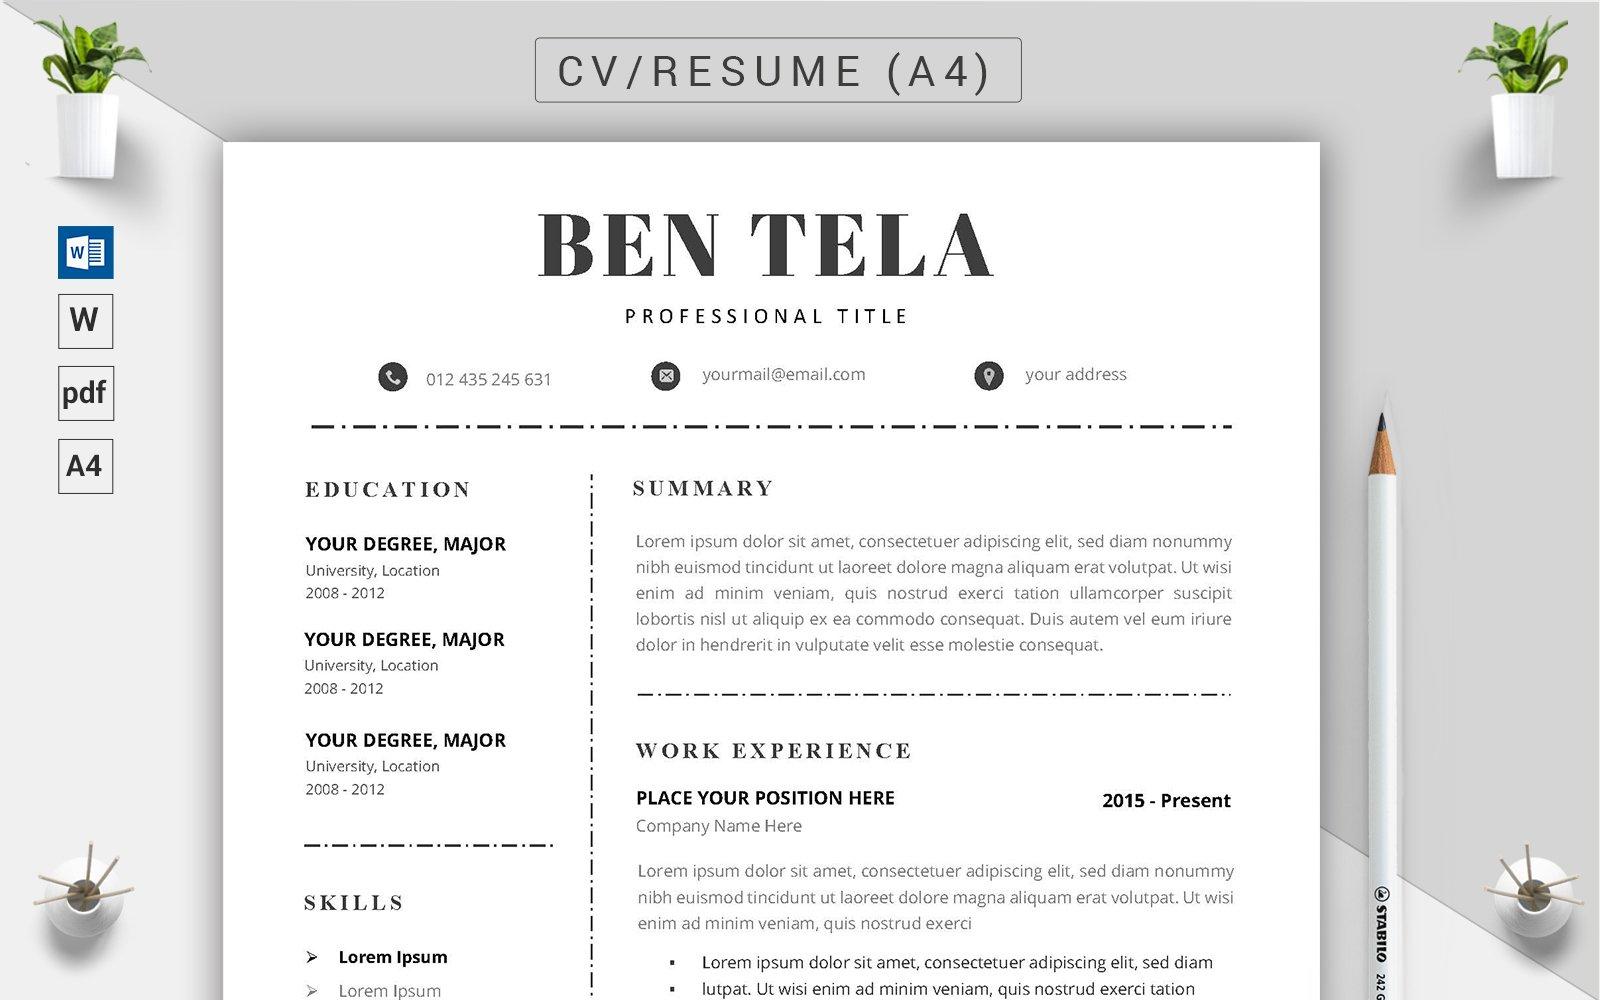 """Ben Tela - CV"" modèle de CV Premium #123184"